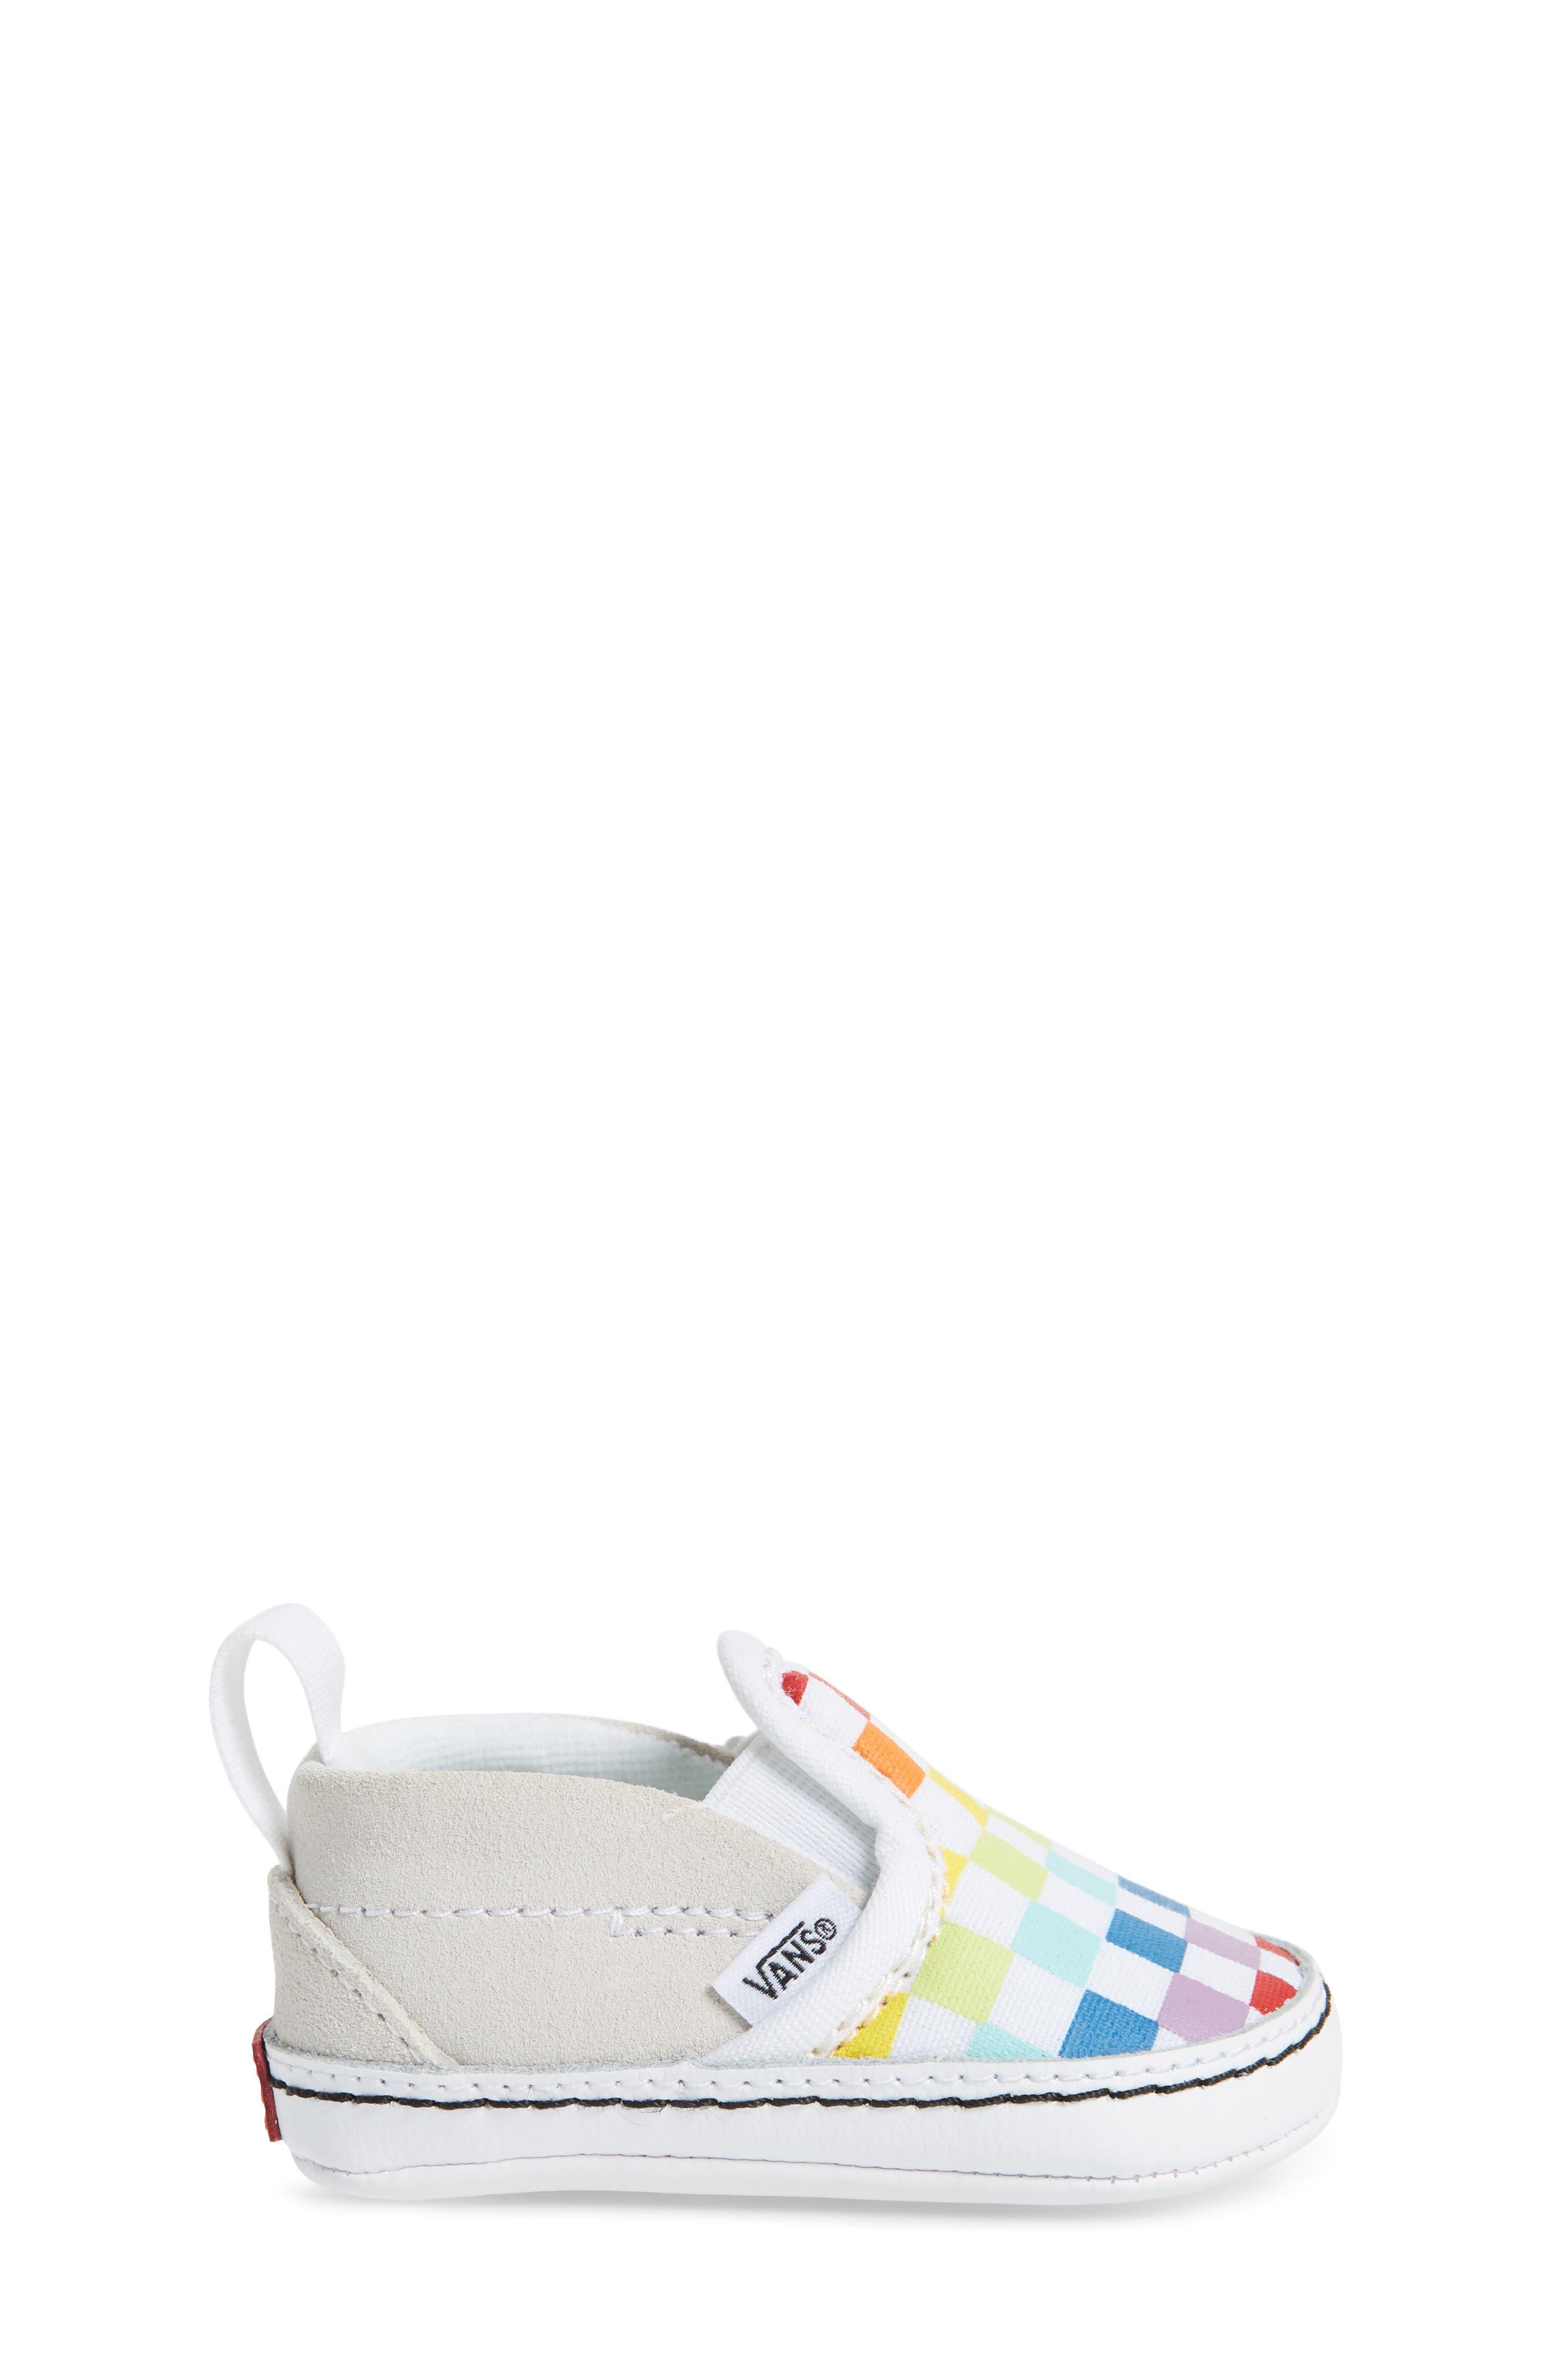 Slip-On Crib Shoe,                             Alternate thumbnail 6, color,                             Checkerboard Rainbow/ White